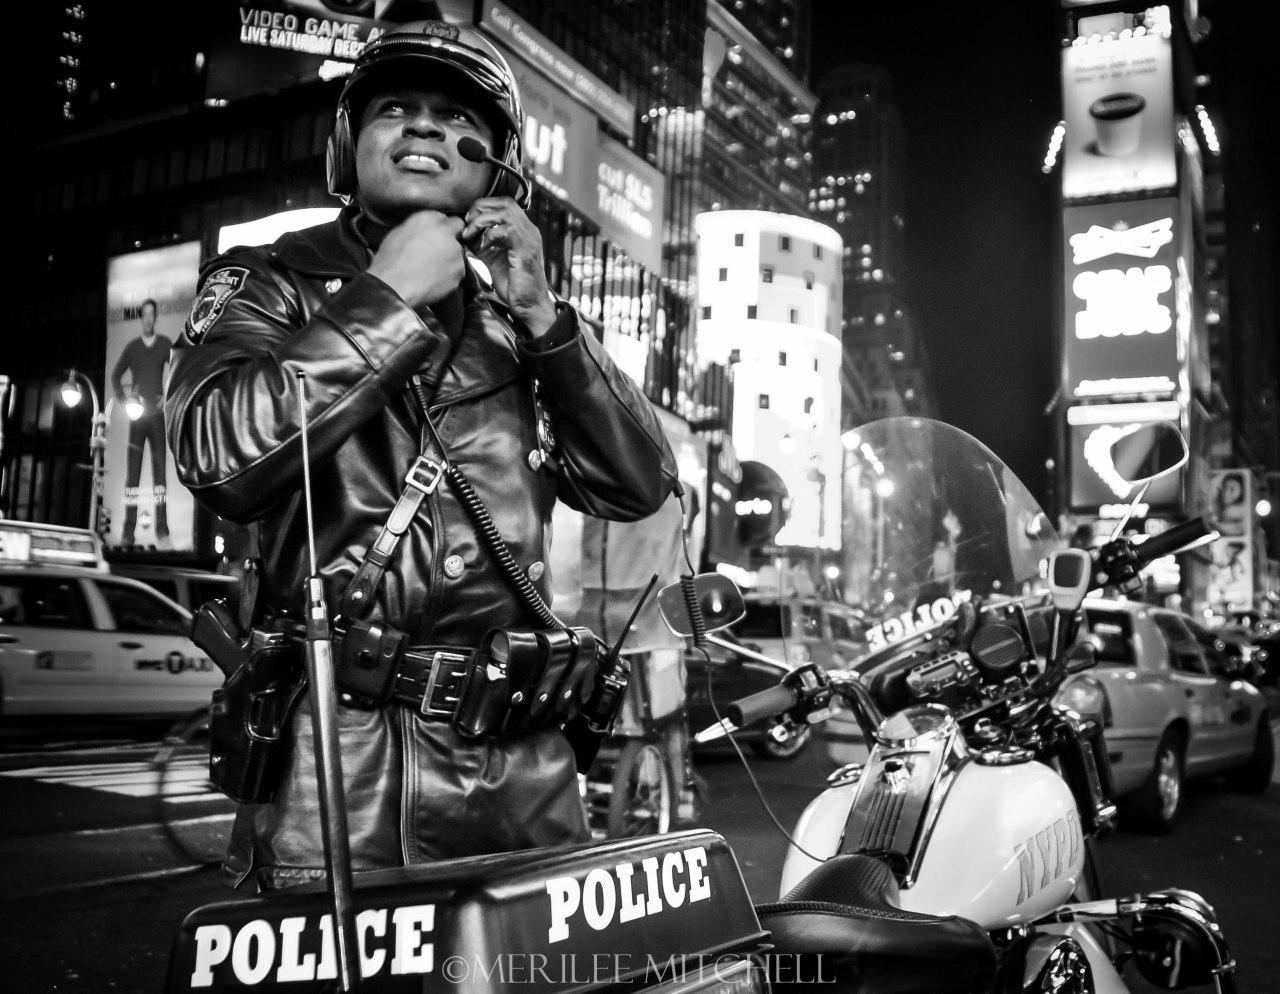 Police. Copyright Merilee Mitchell